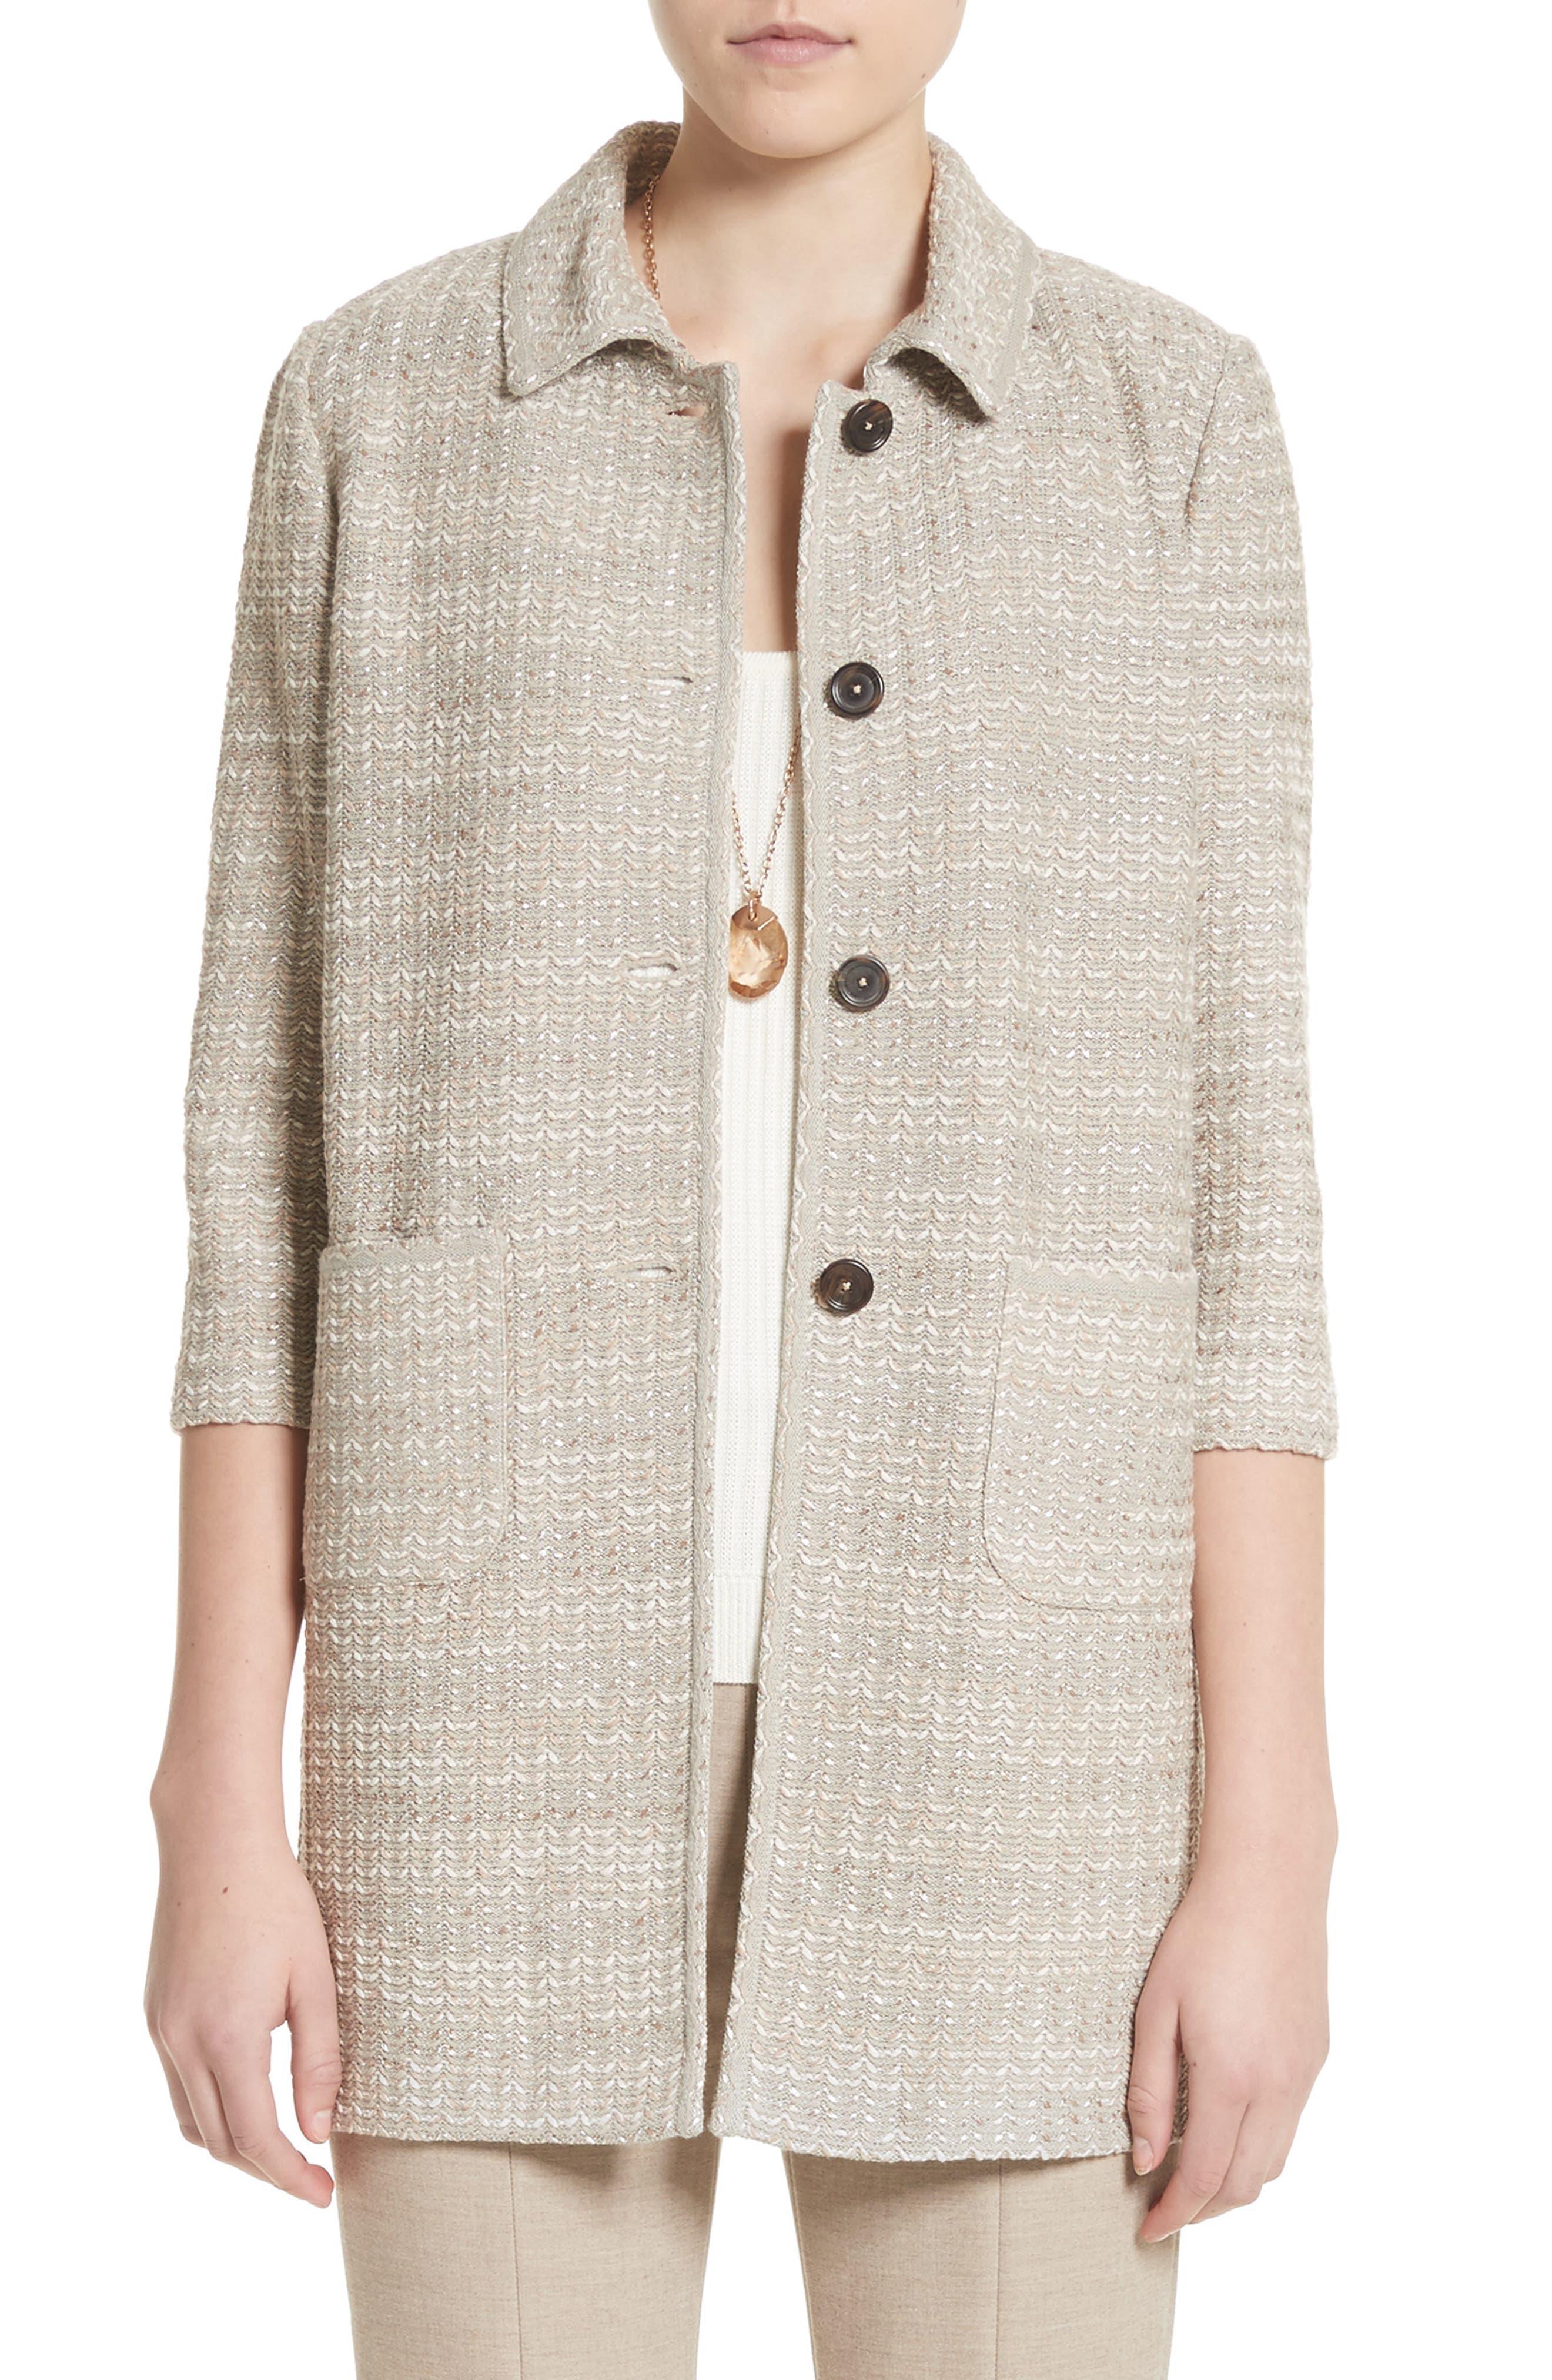 Main Image - St. John Collection Chevron Knit Shantung Jacket